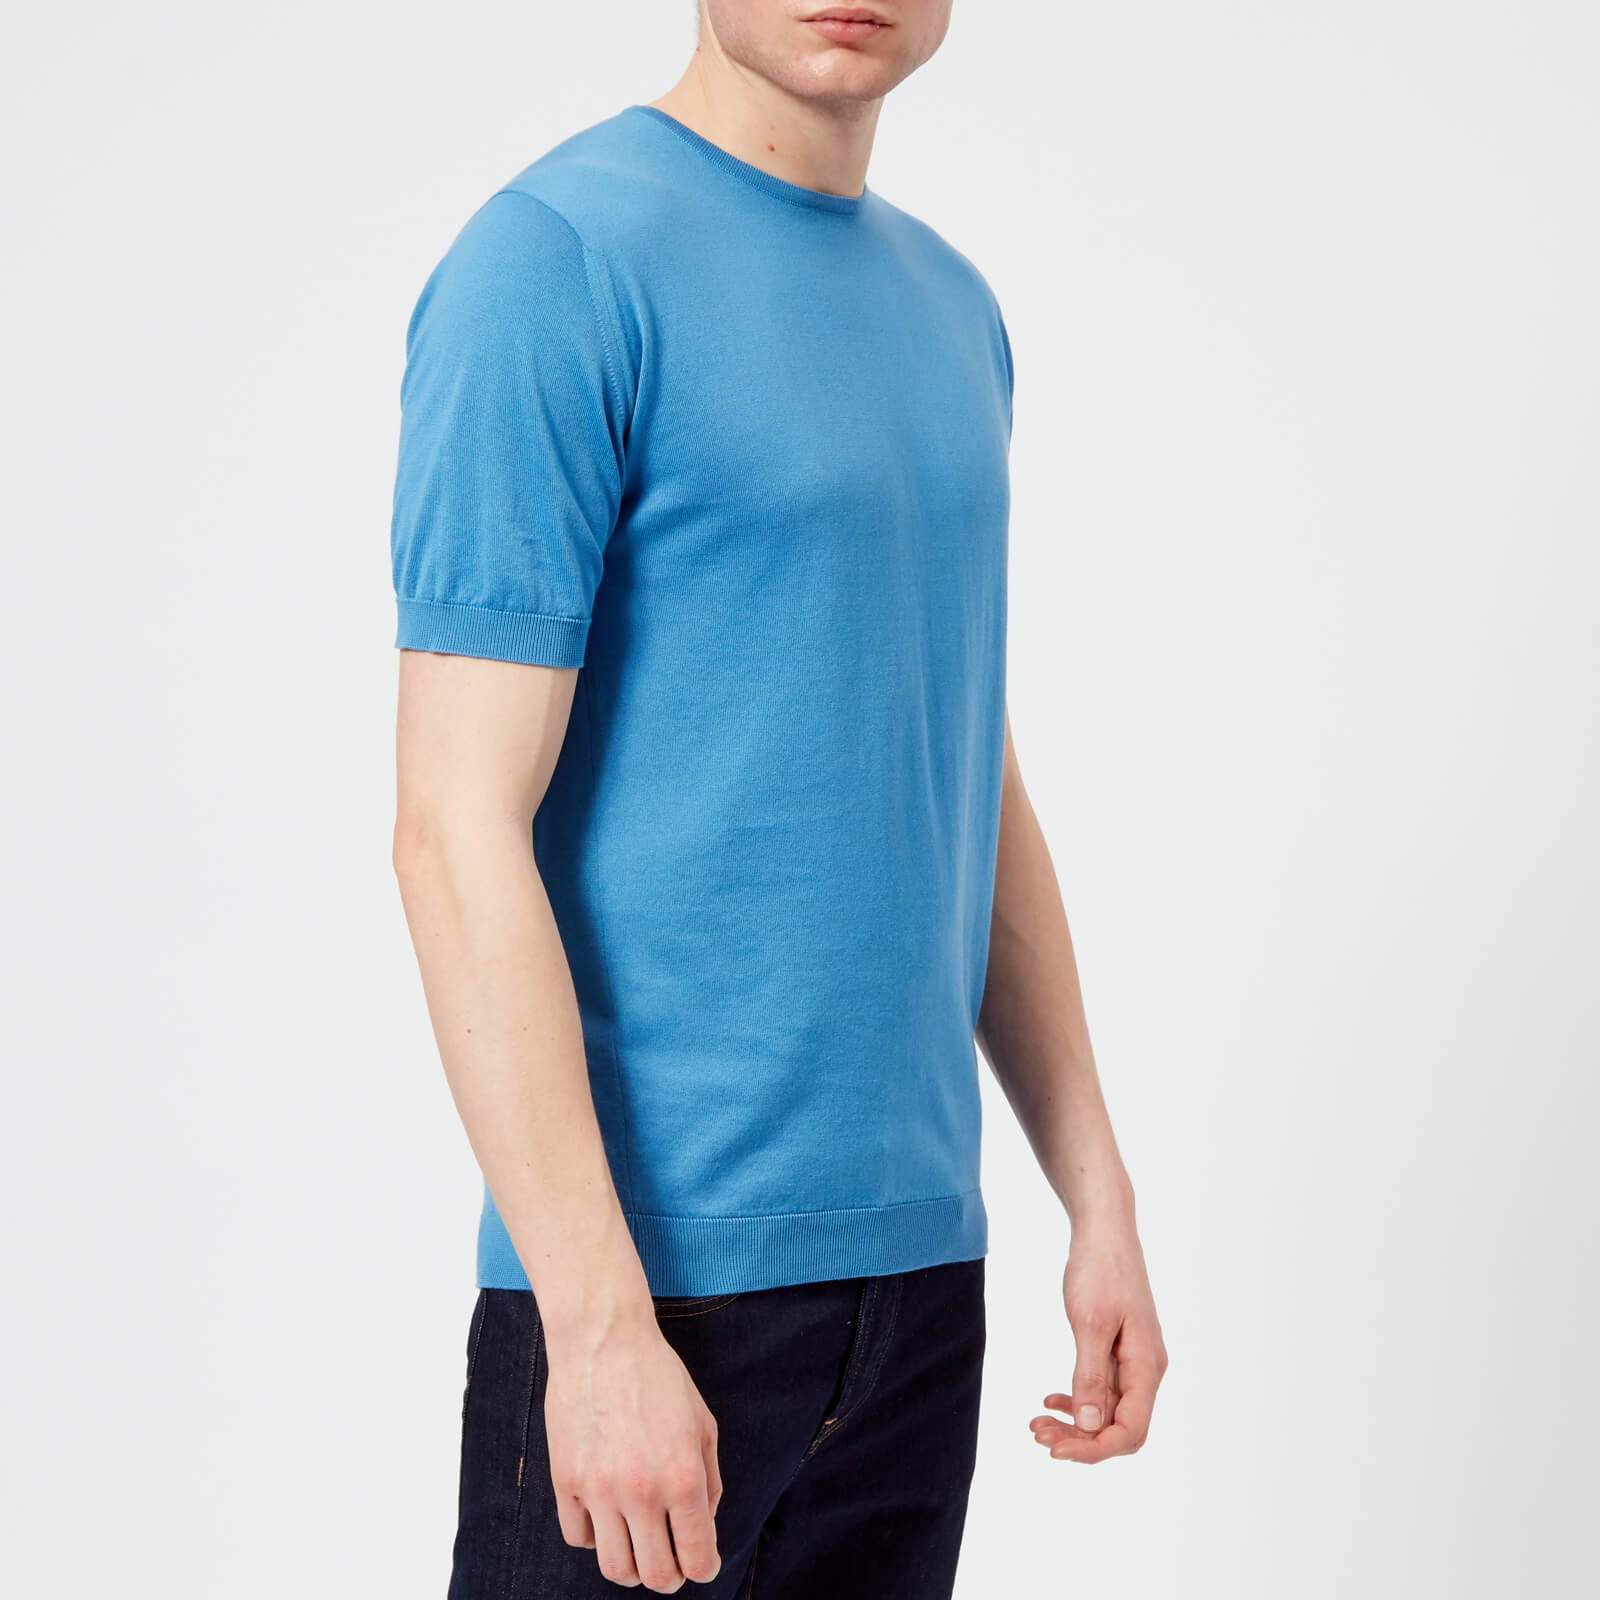 01a759029120 John Smedley Men's Belden 30 Gauge Sea Island Cotton T-Shirt - Chambray Blue  Clothing | TheHut.com